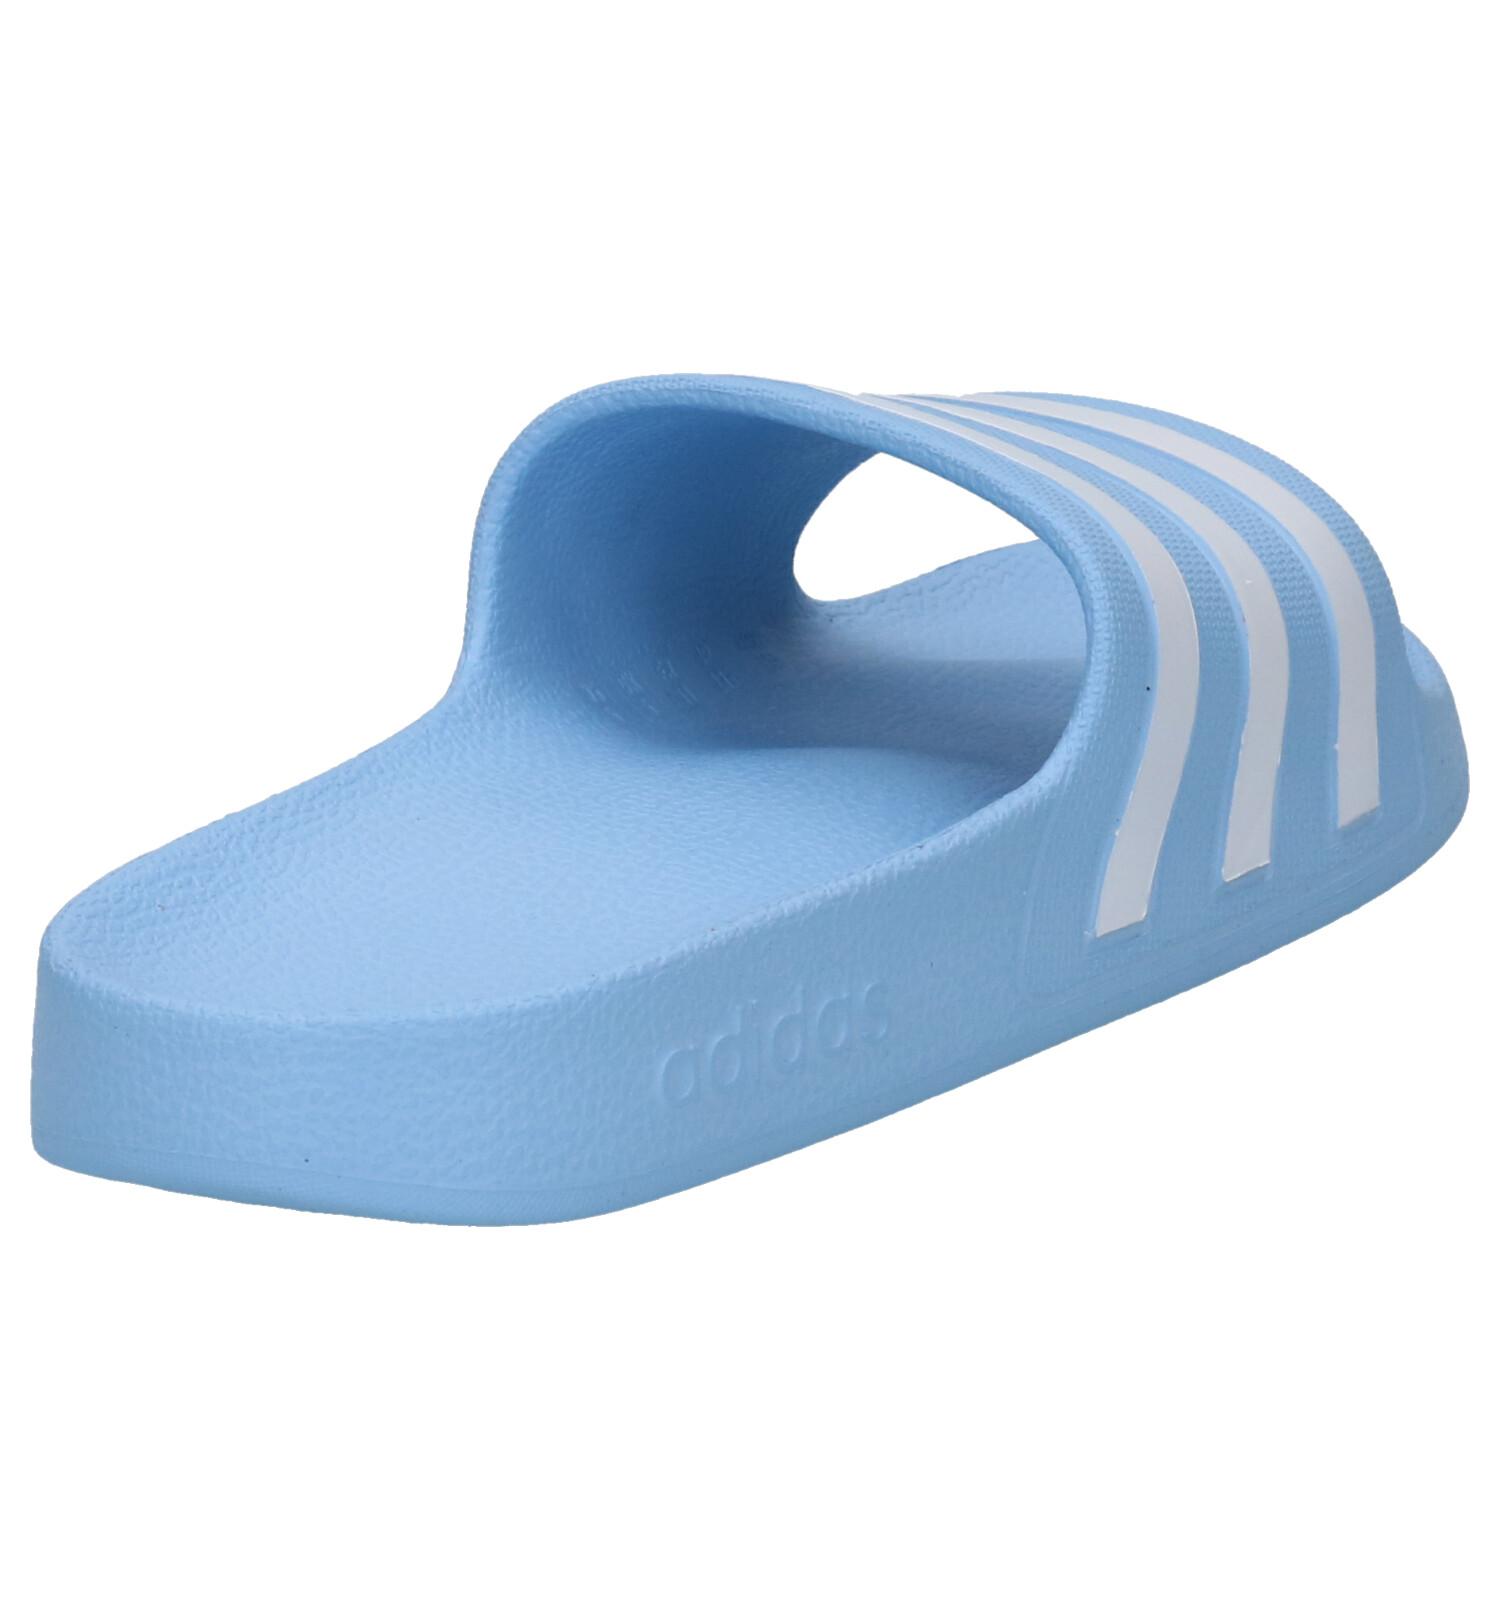 Slippers Adidas Aqua Blauwe Adilette Aqua Adilette Adidas Blauwe xQCstrBdh